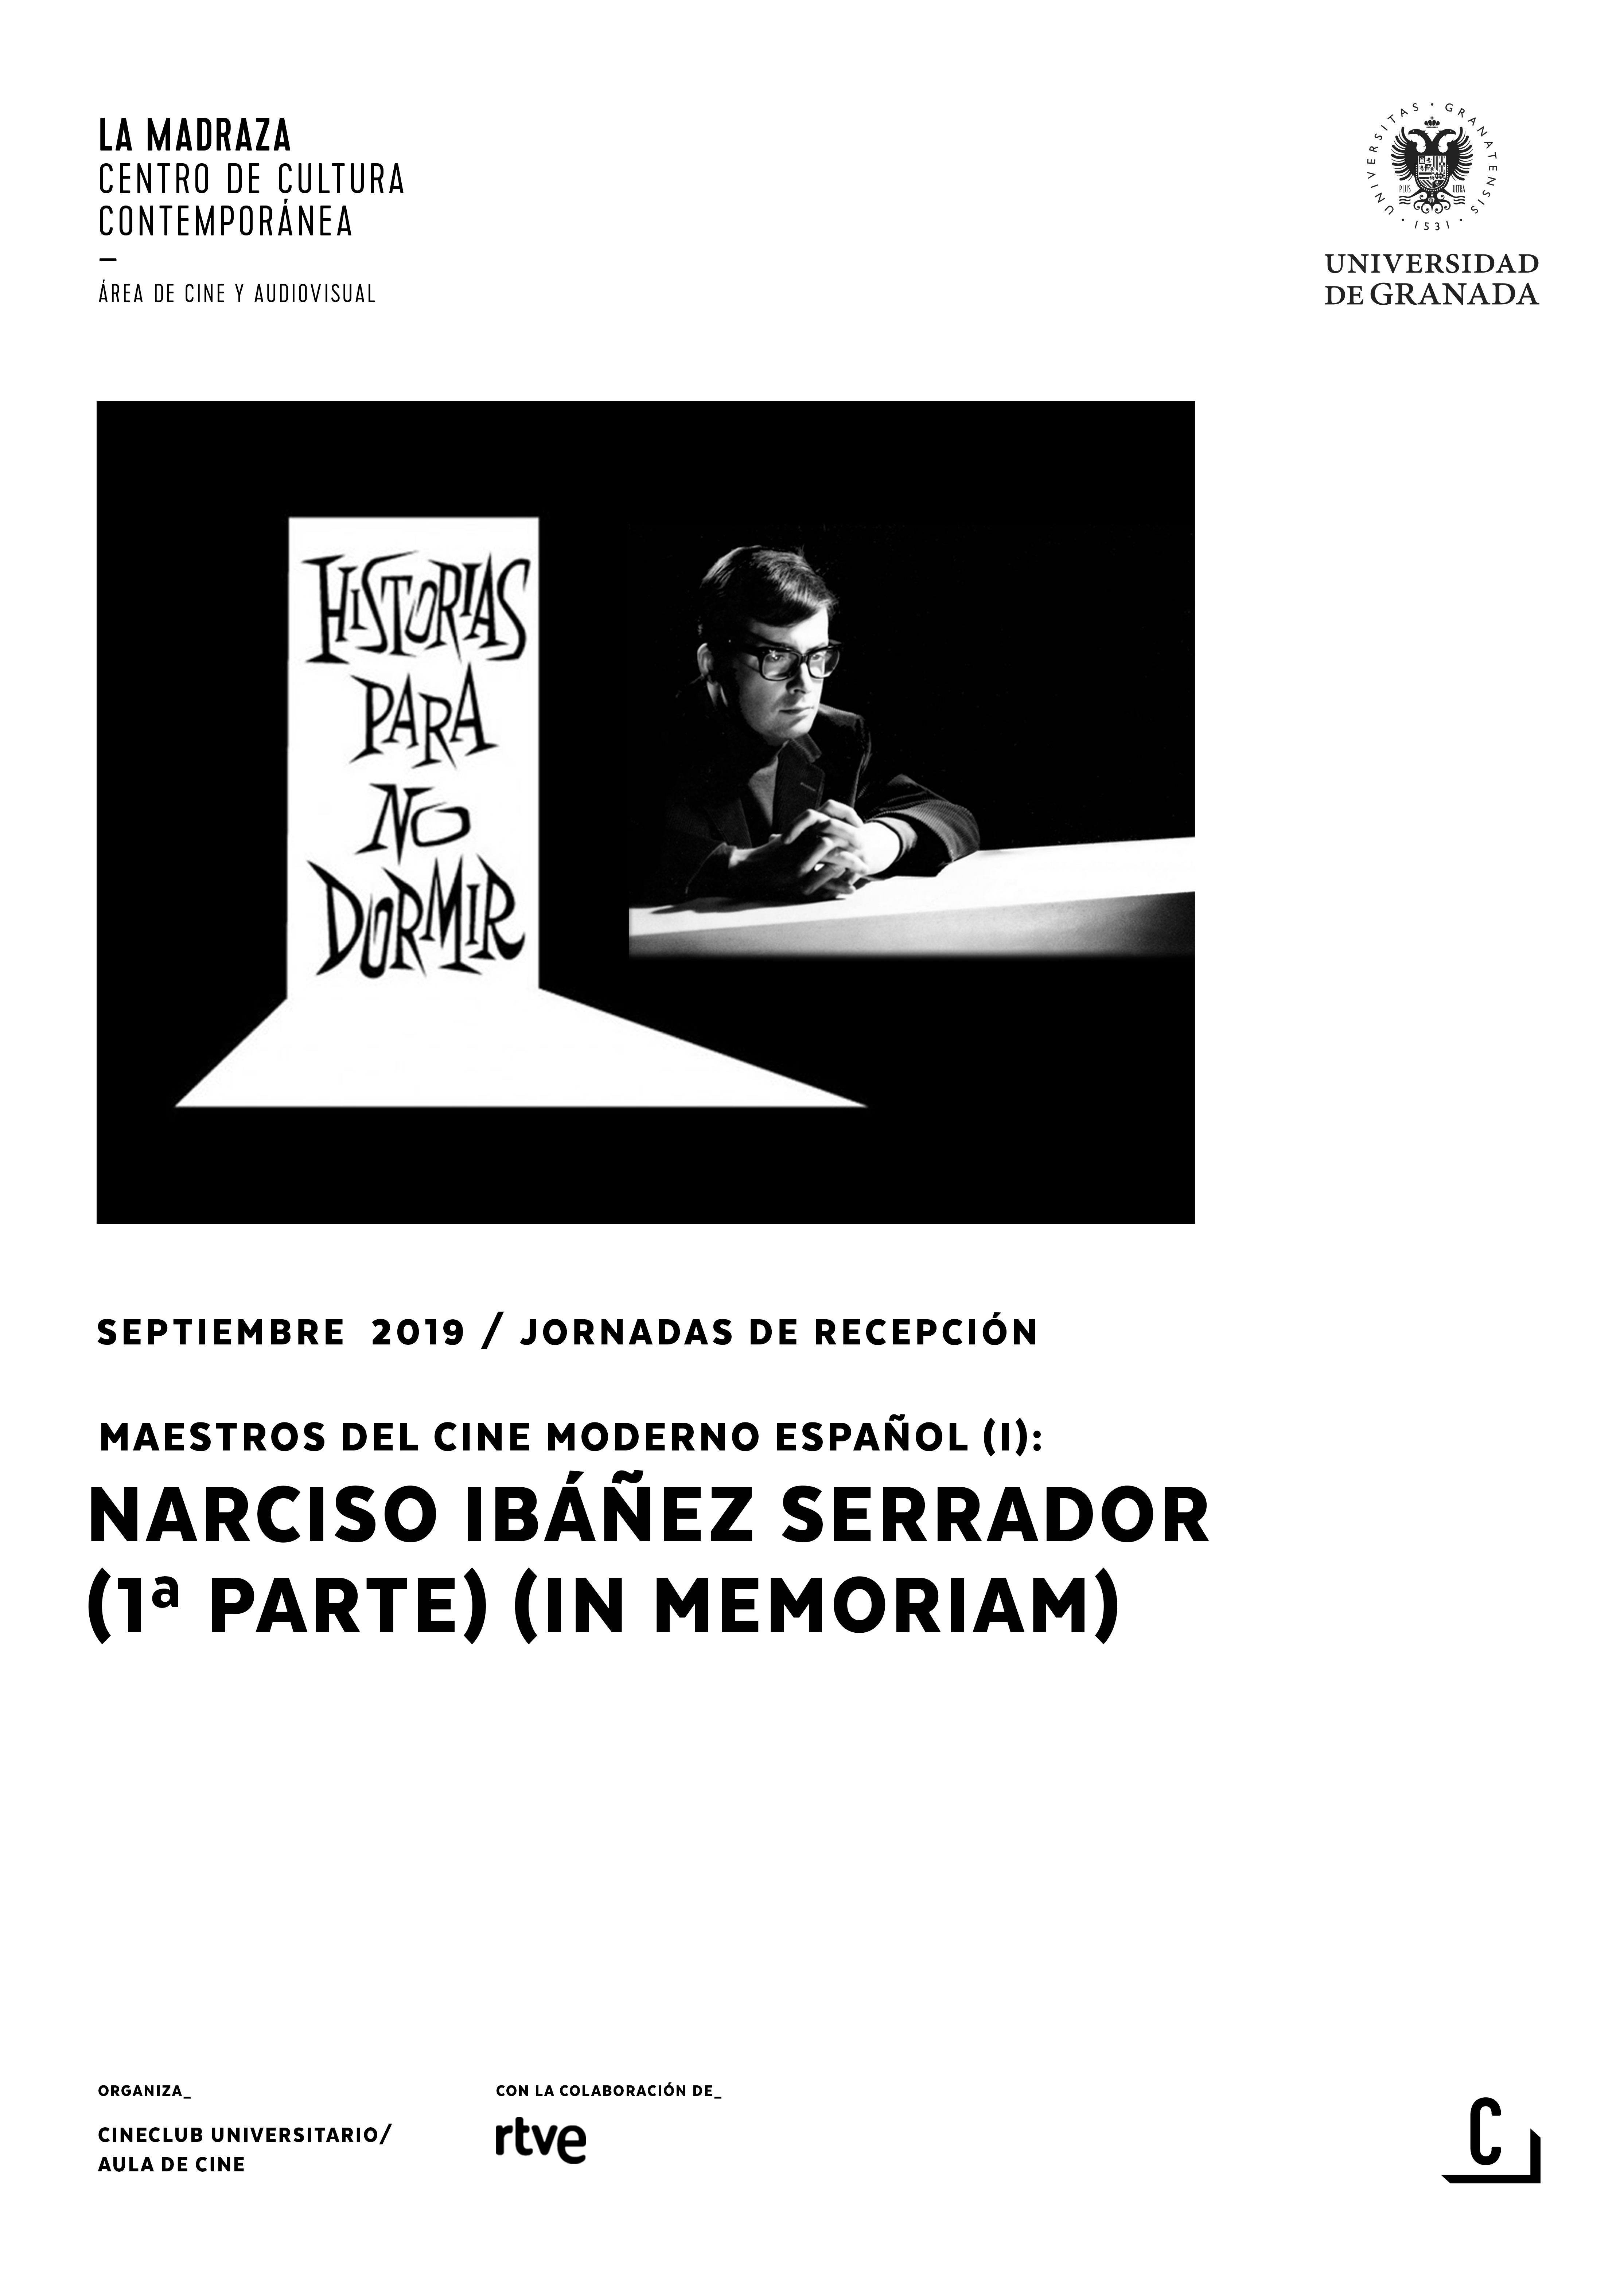 Imagen de portada de Maestros del cine moderno español (I): Narciso Ibáñez Serrador (1ªparte)